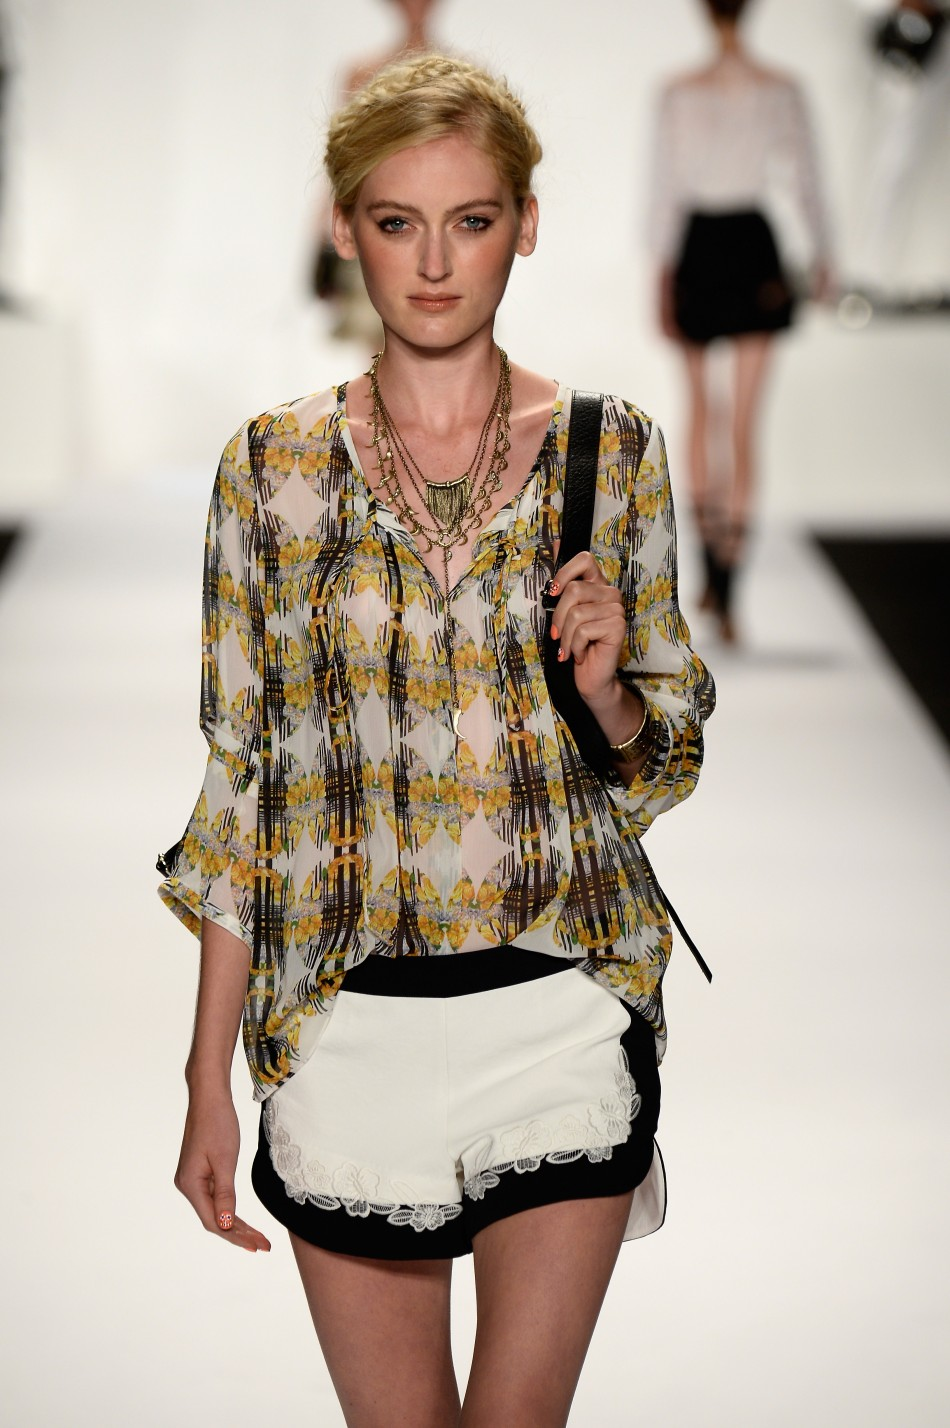 20589-rebecca-minkoff-spring-2014-new-york-fashion-week.jpg